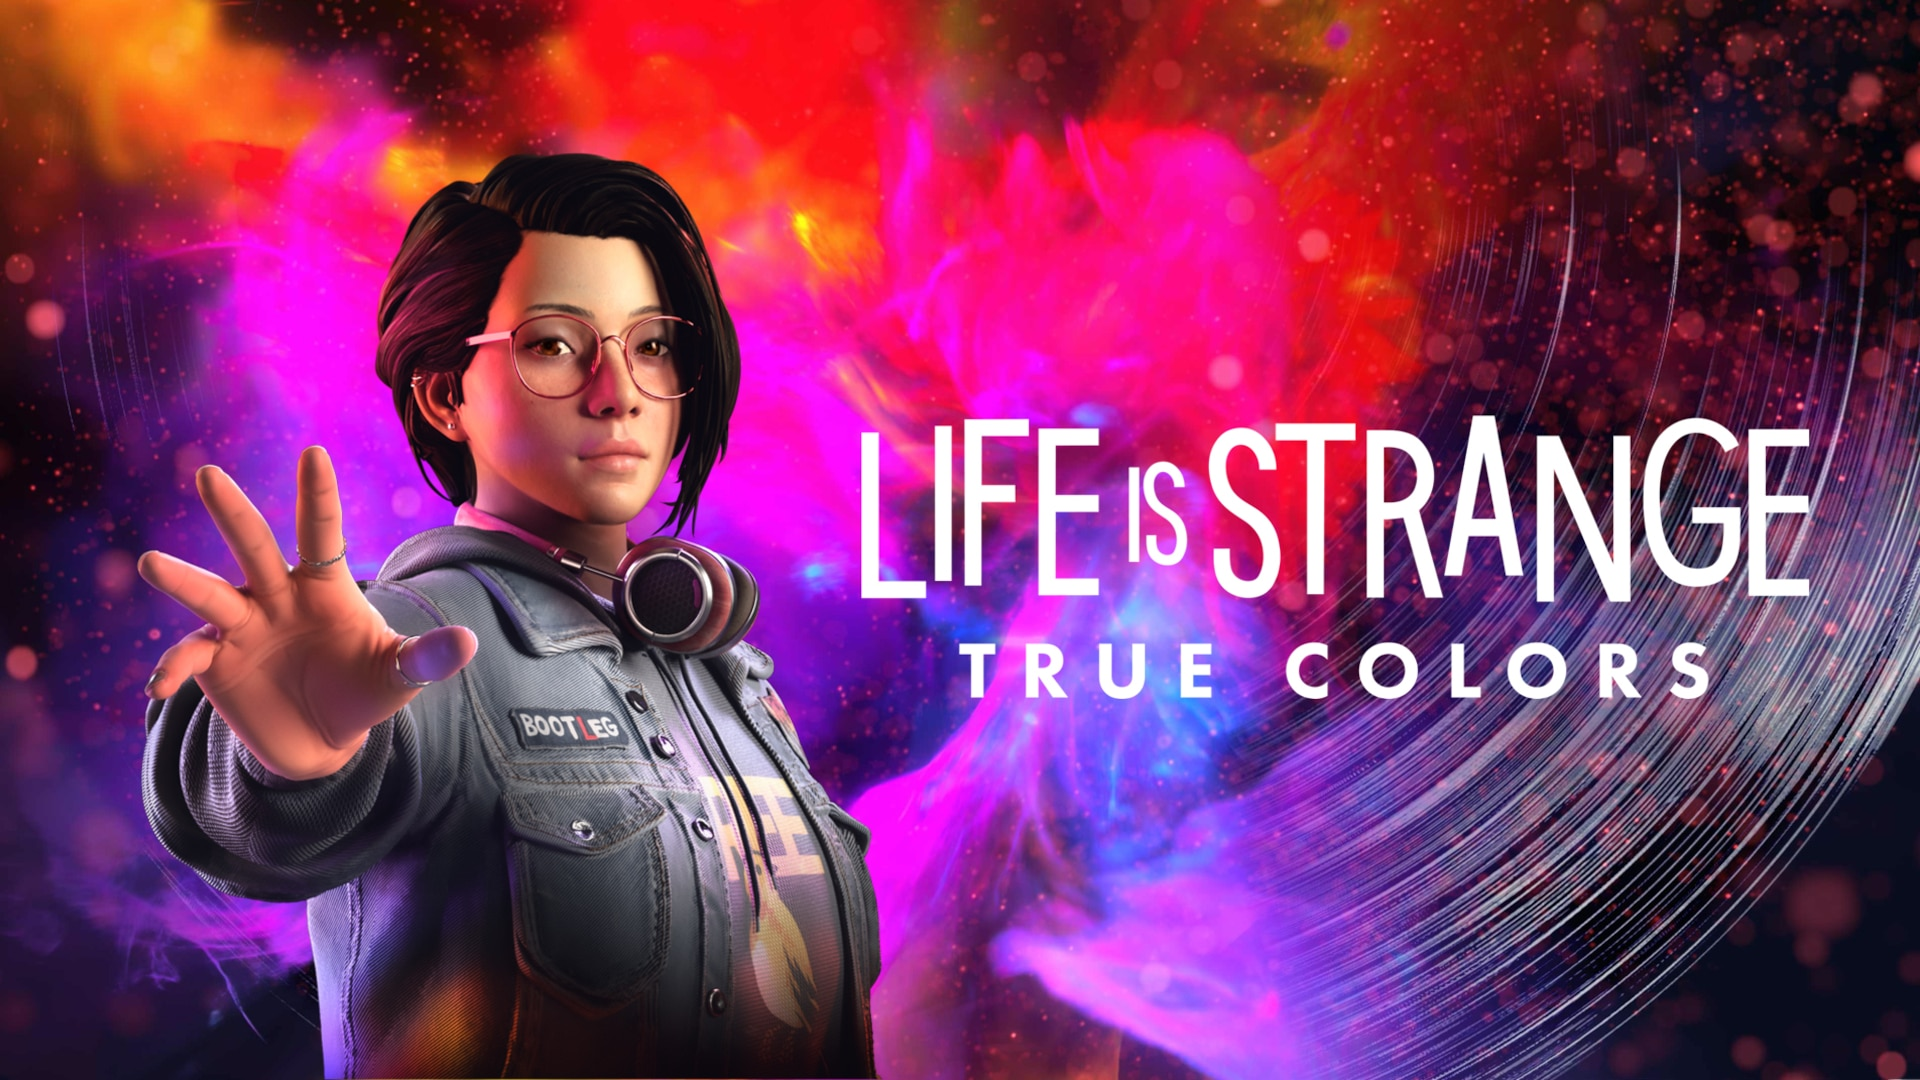 Life is Strange True Colors Promo Poster